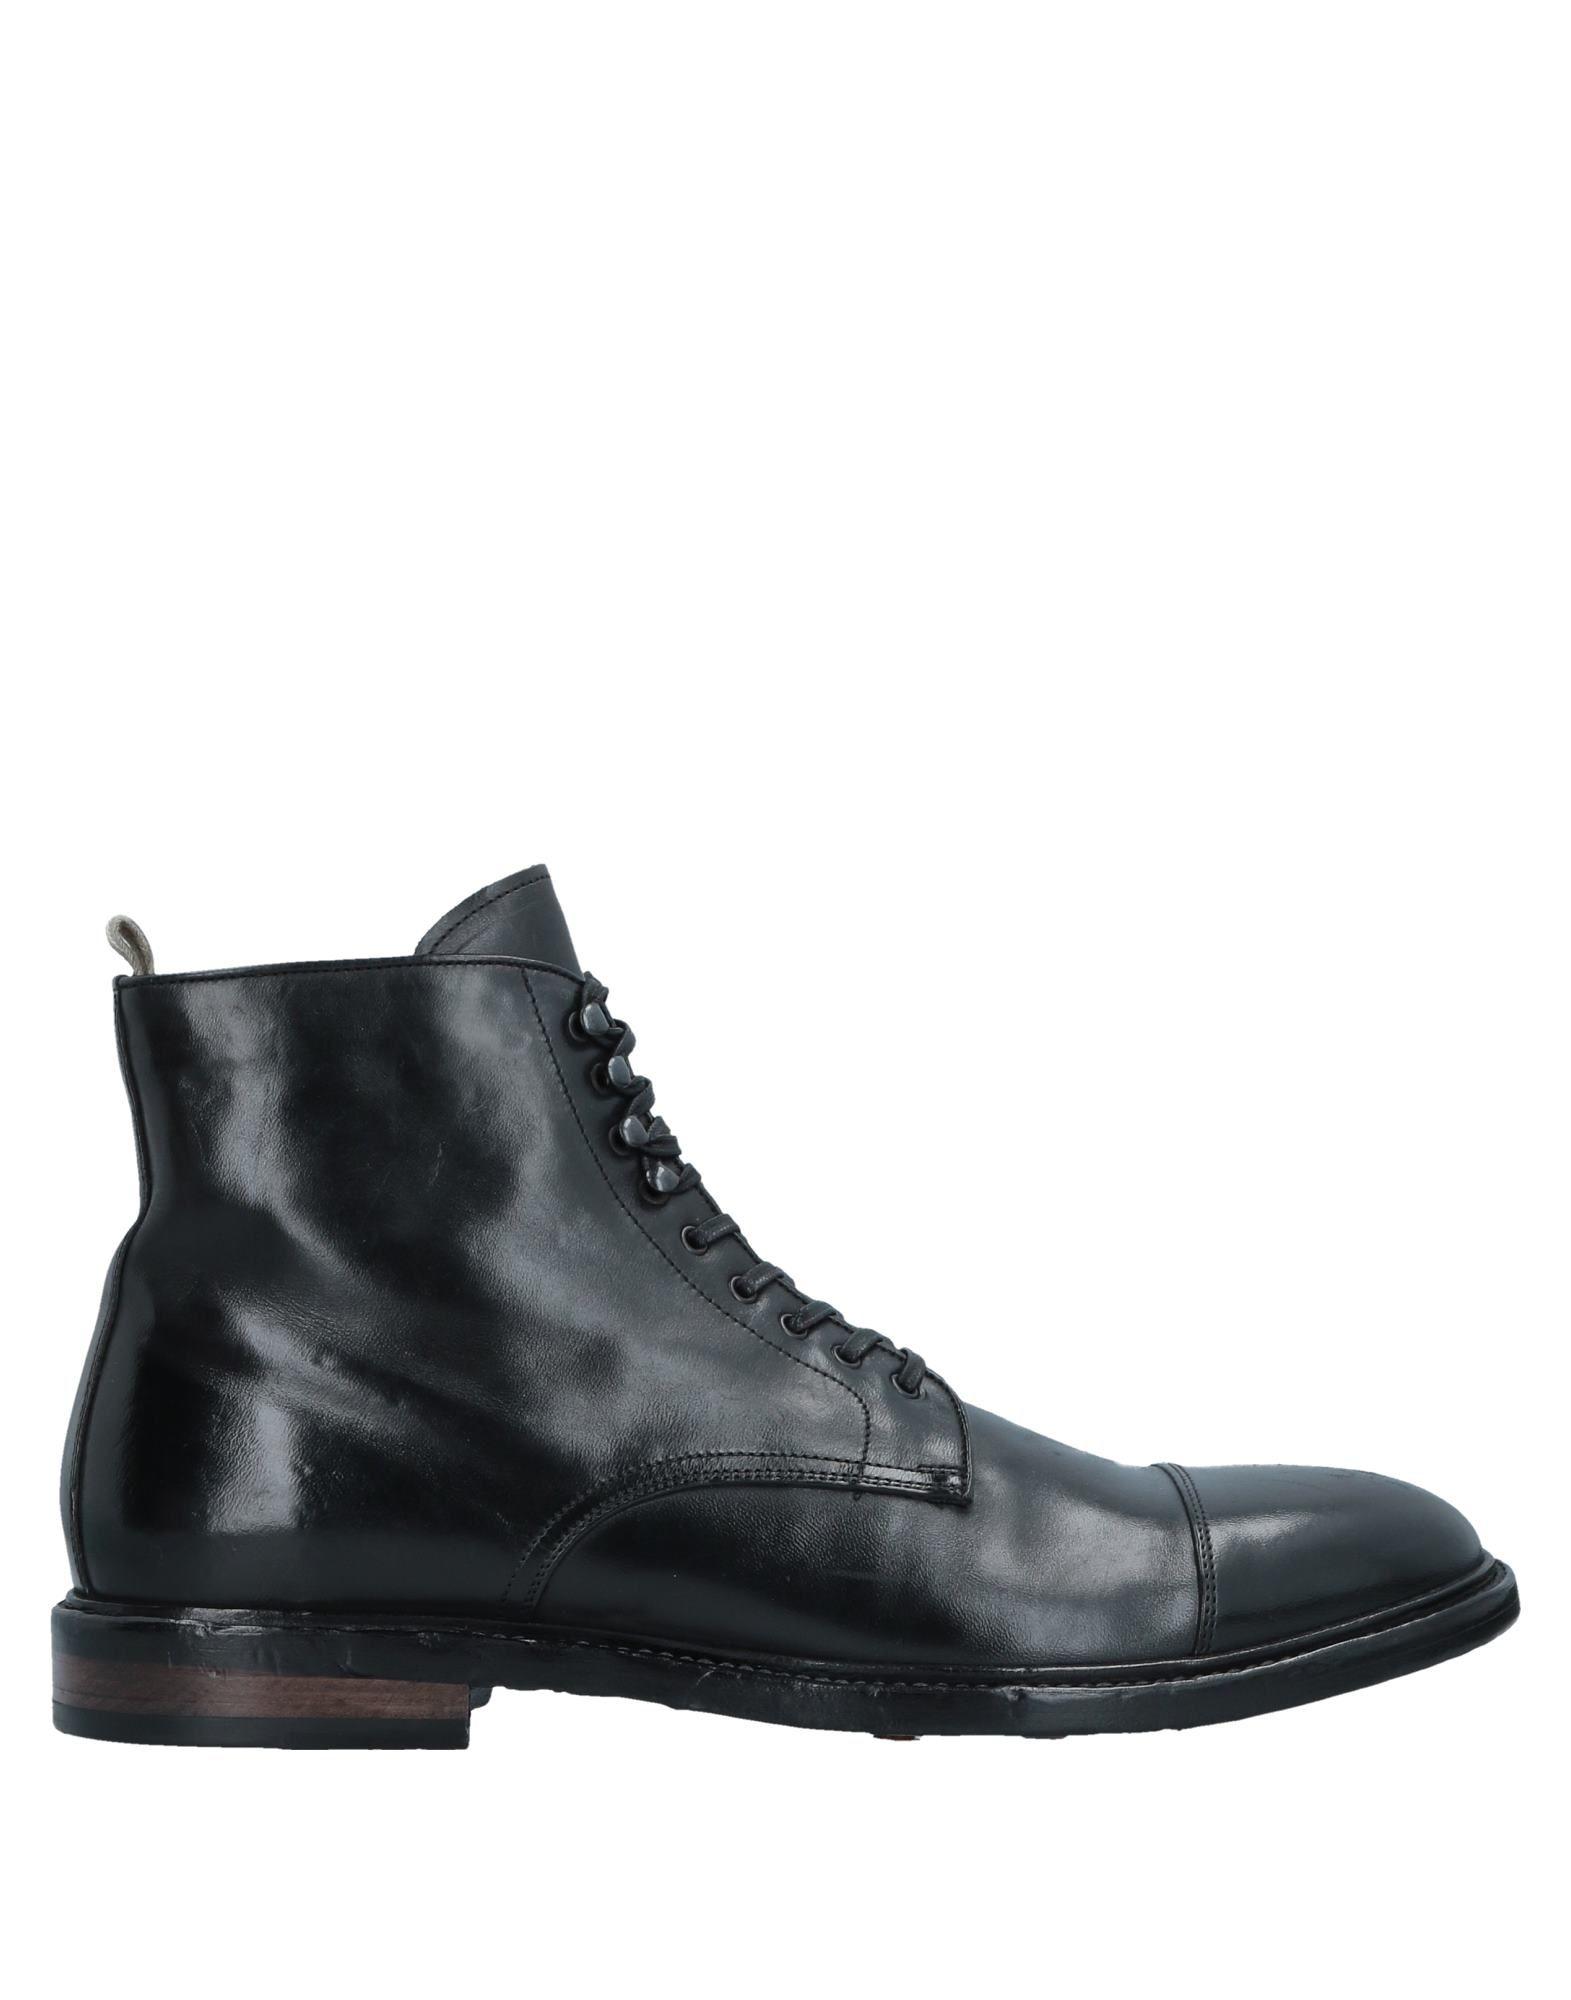 Officine Creative Italia Stiefelette Herren  11513247RW Neue Schuhe